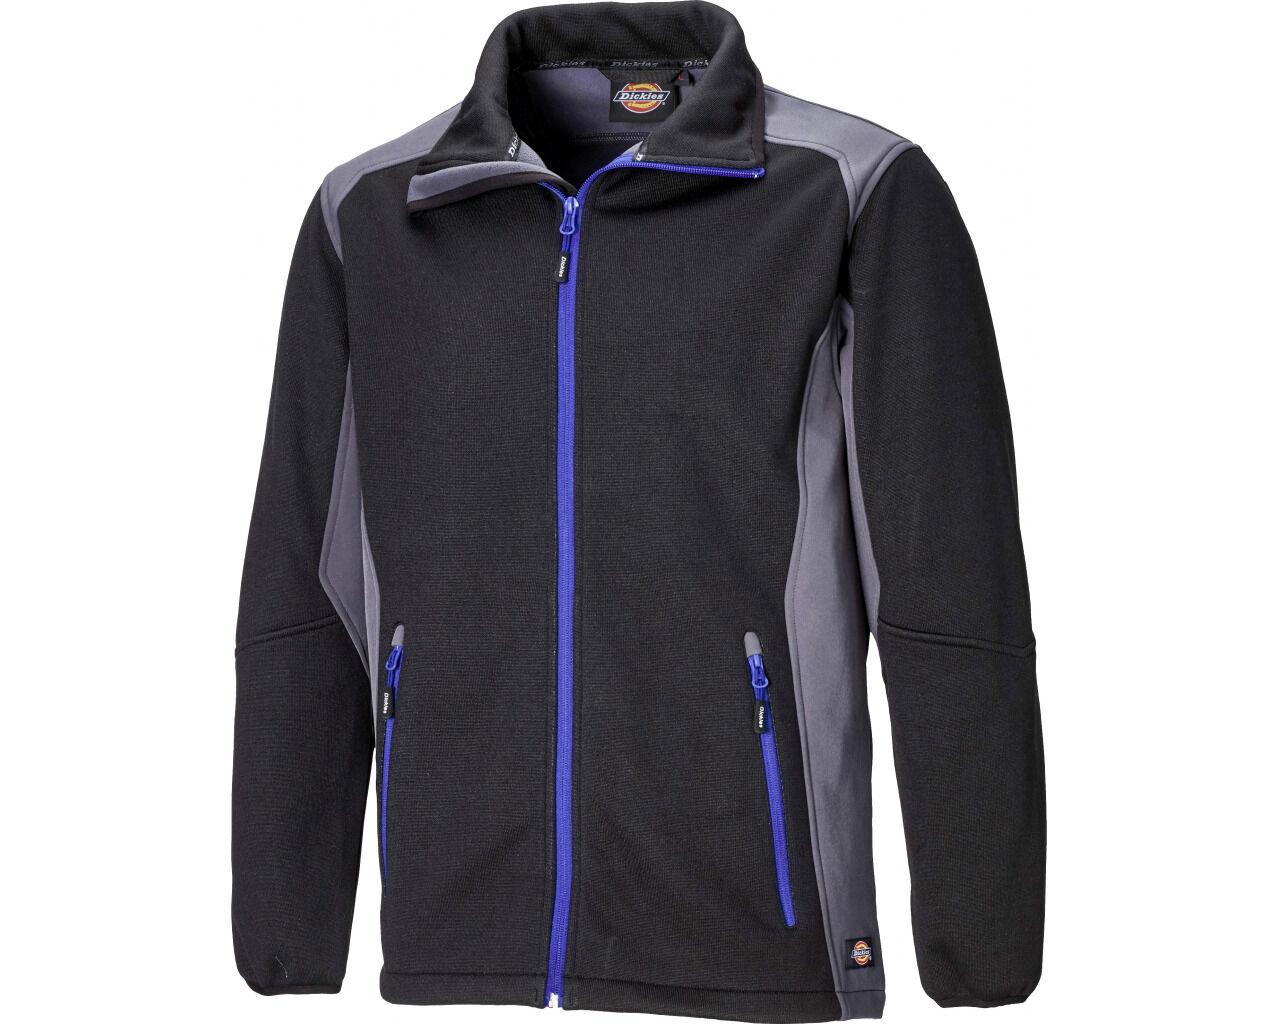 Dickies Lewiston Jacke Herren Schwarz Premium Qualität Contrast Mantel JW7014 UK